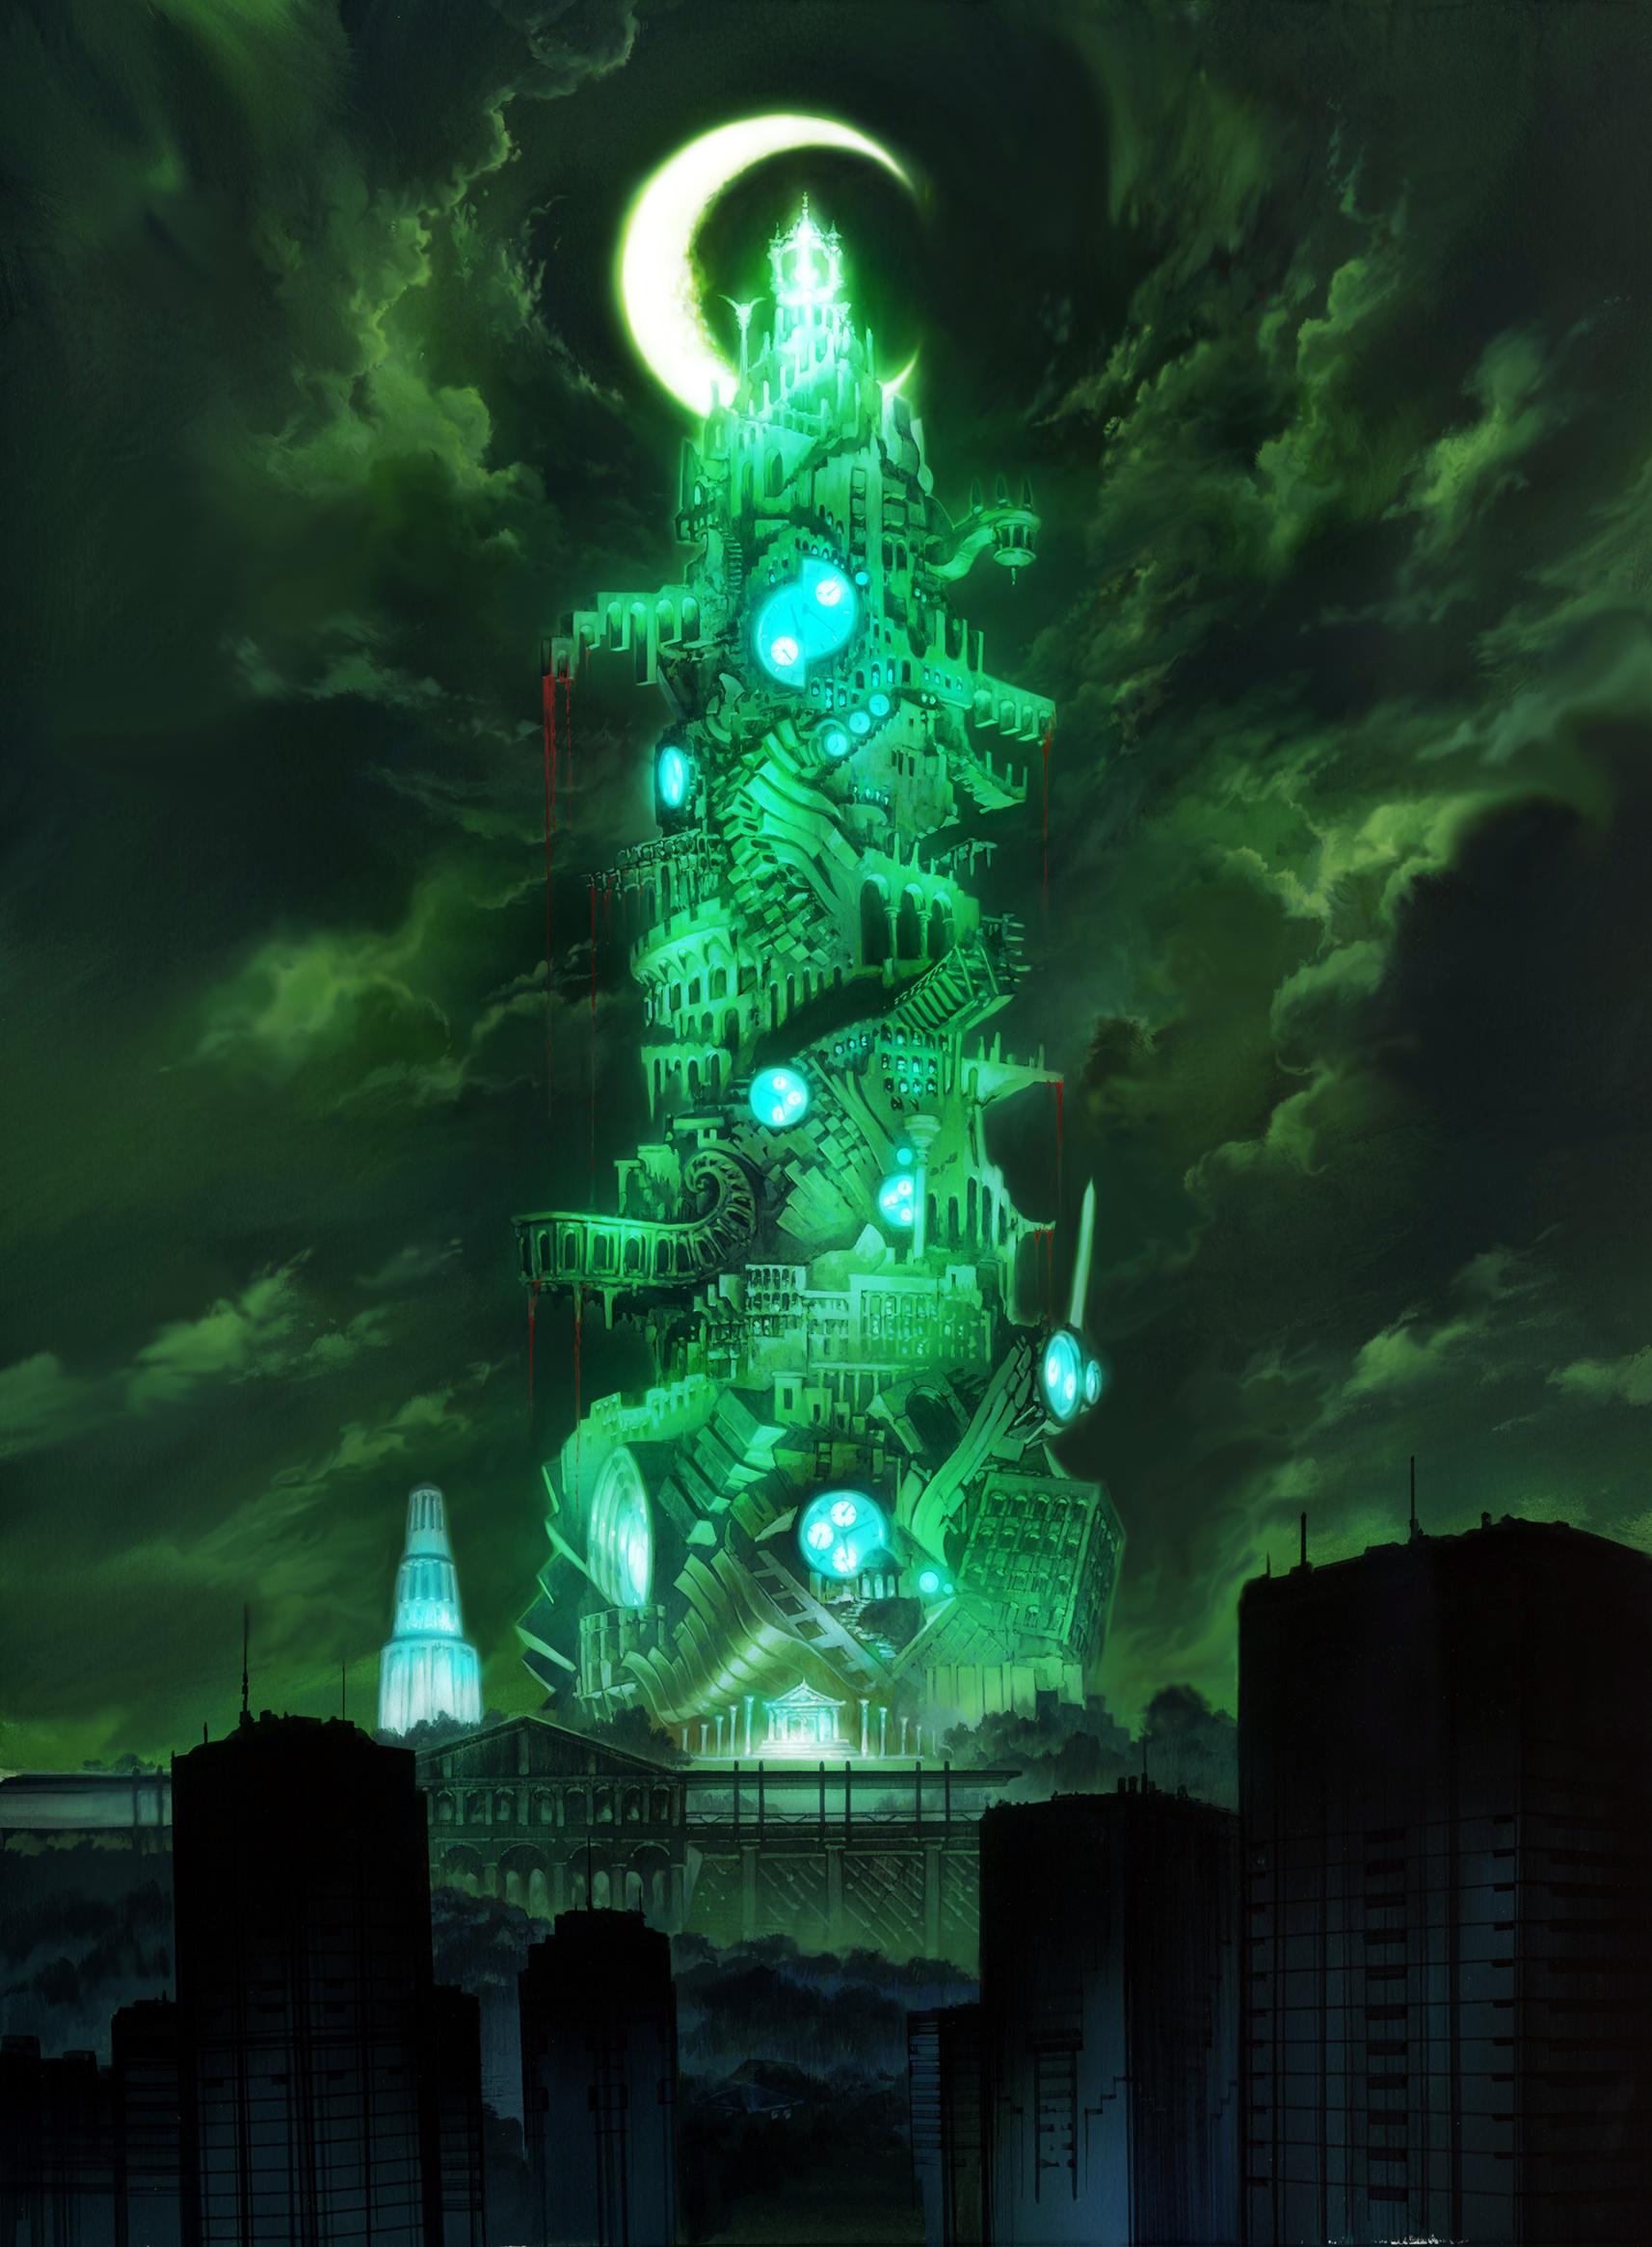 Tartarus Megami Tensei Wiki Fandom Powered By Wikia